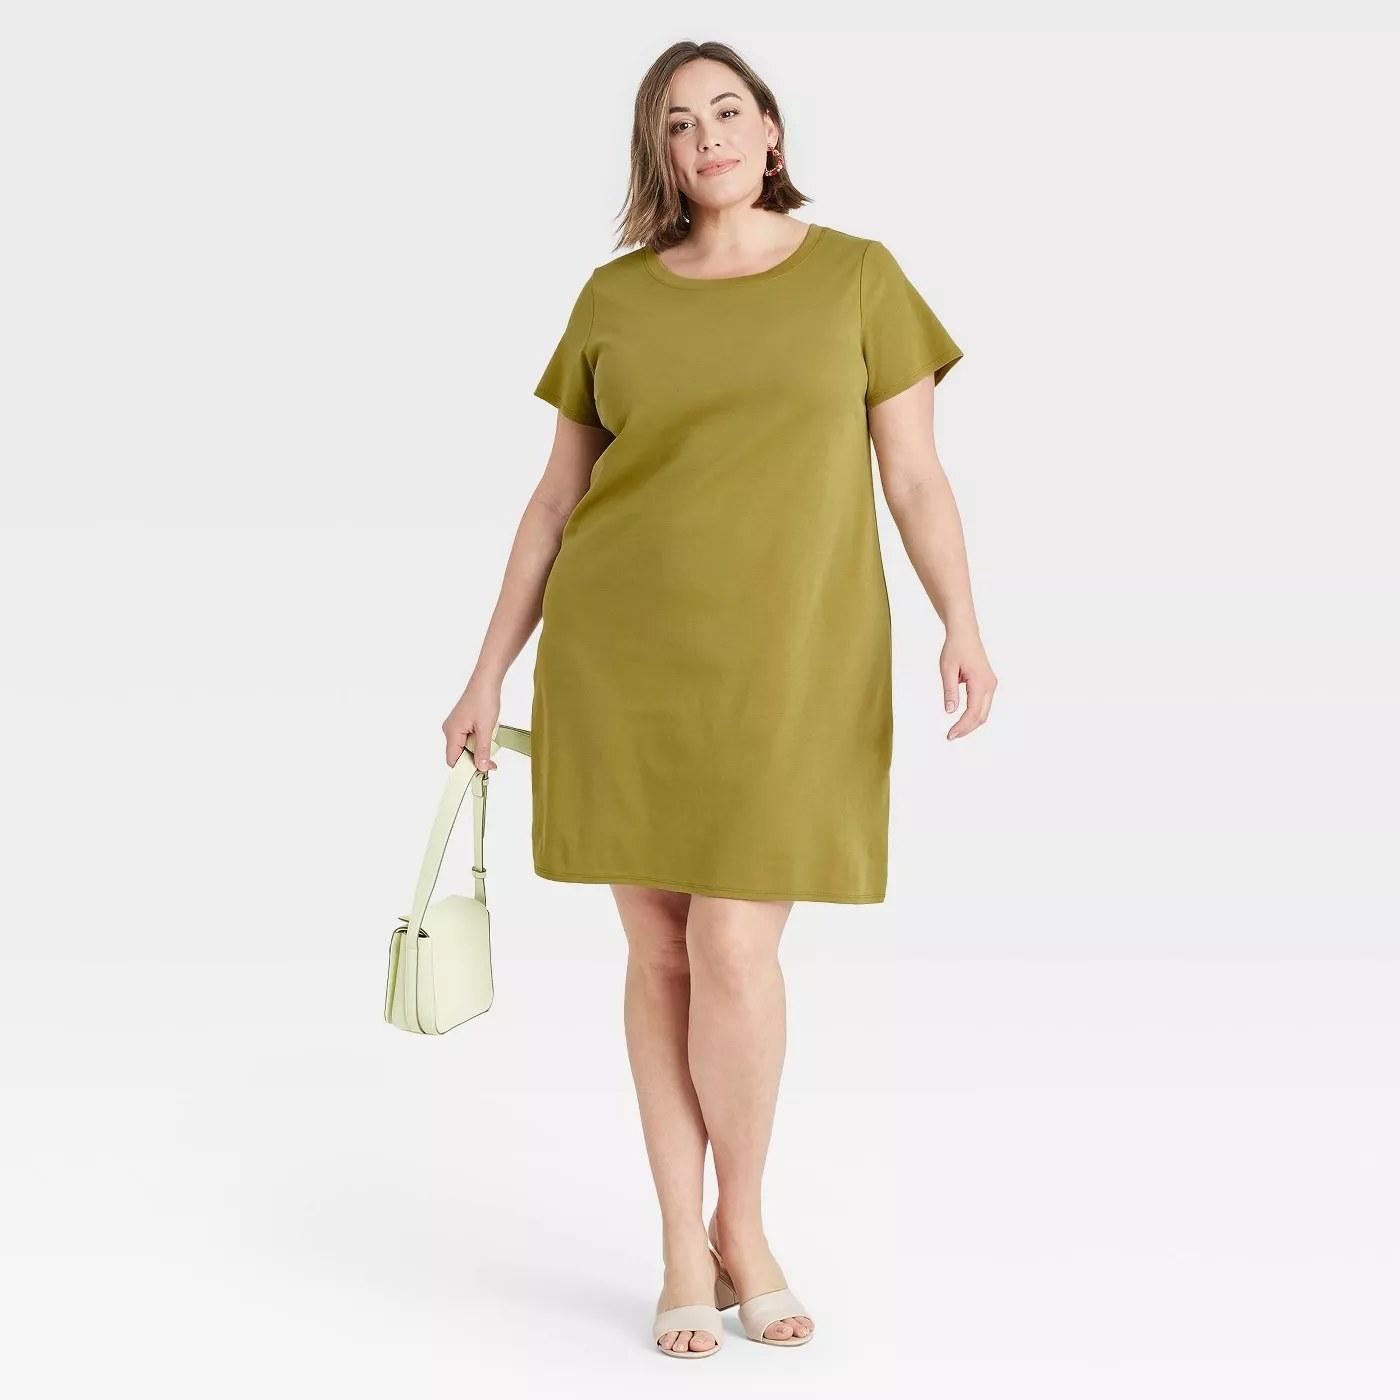 A model wearing the T-shirt dress in green